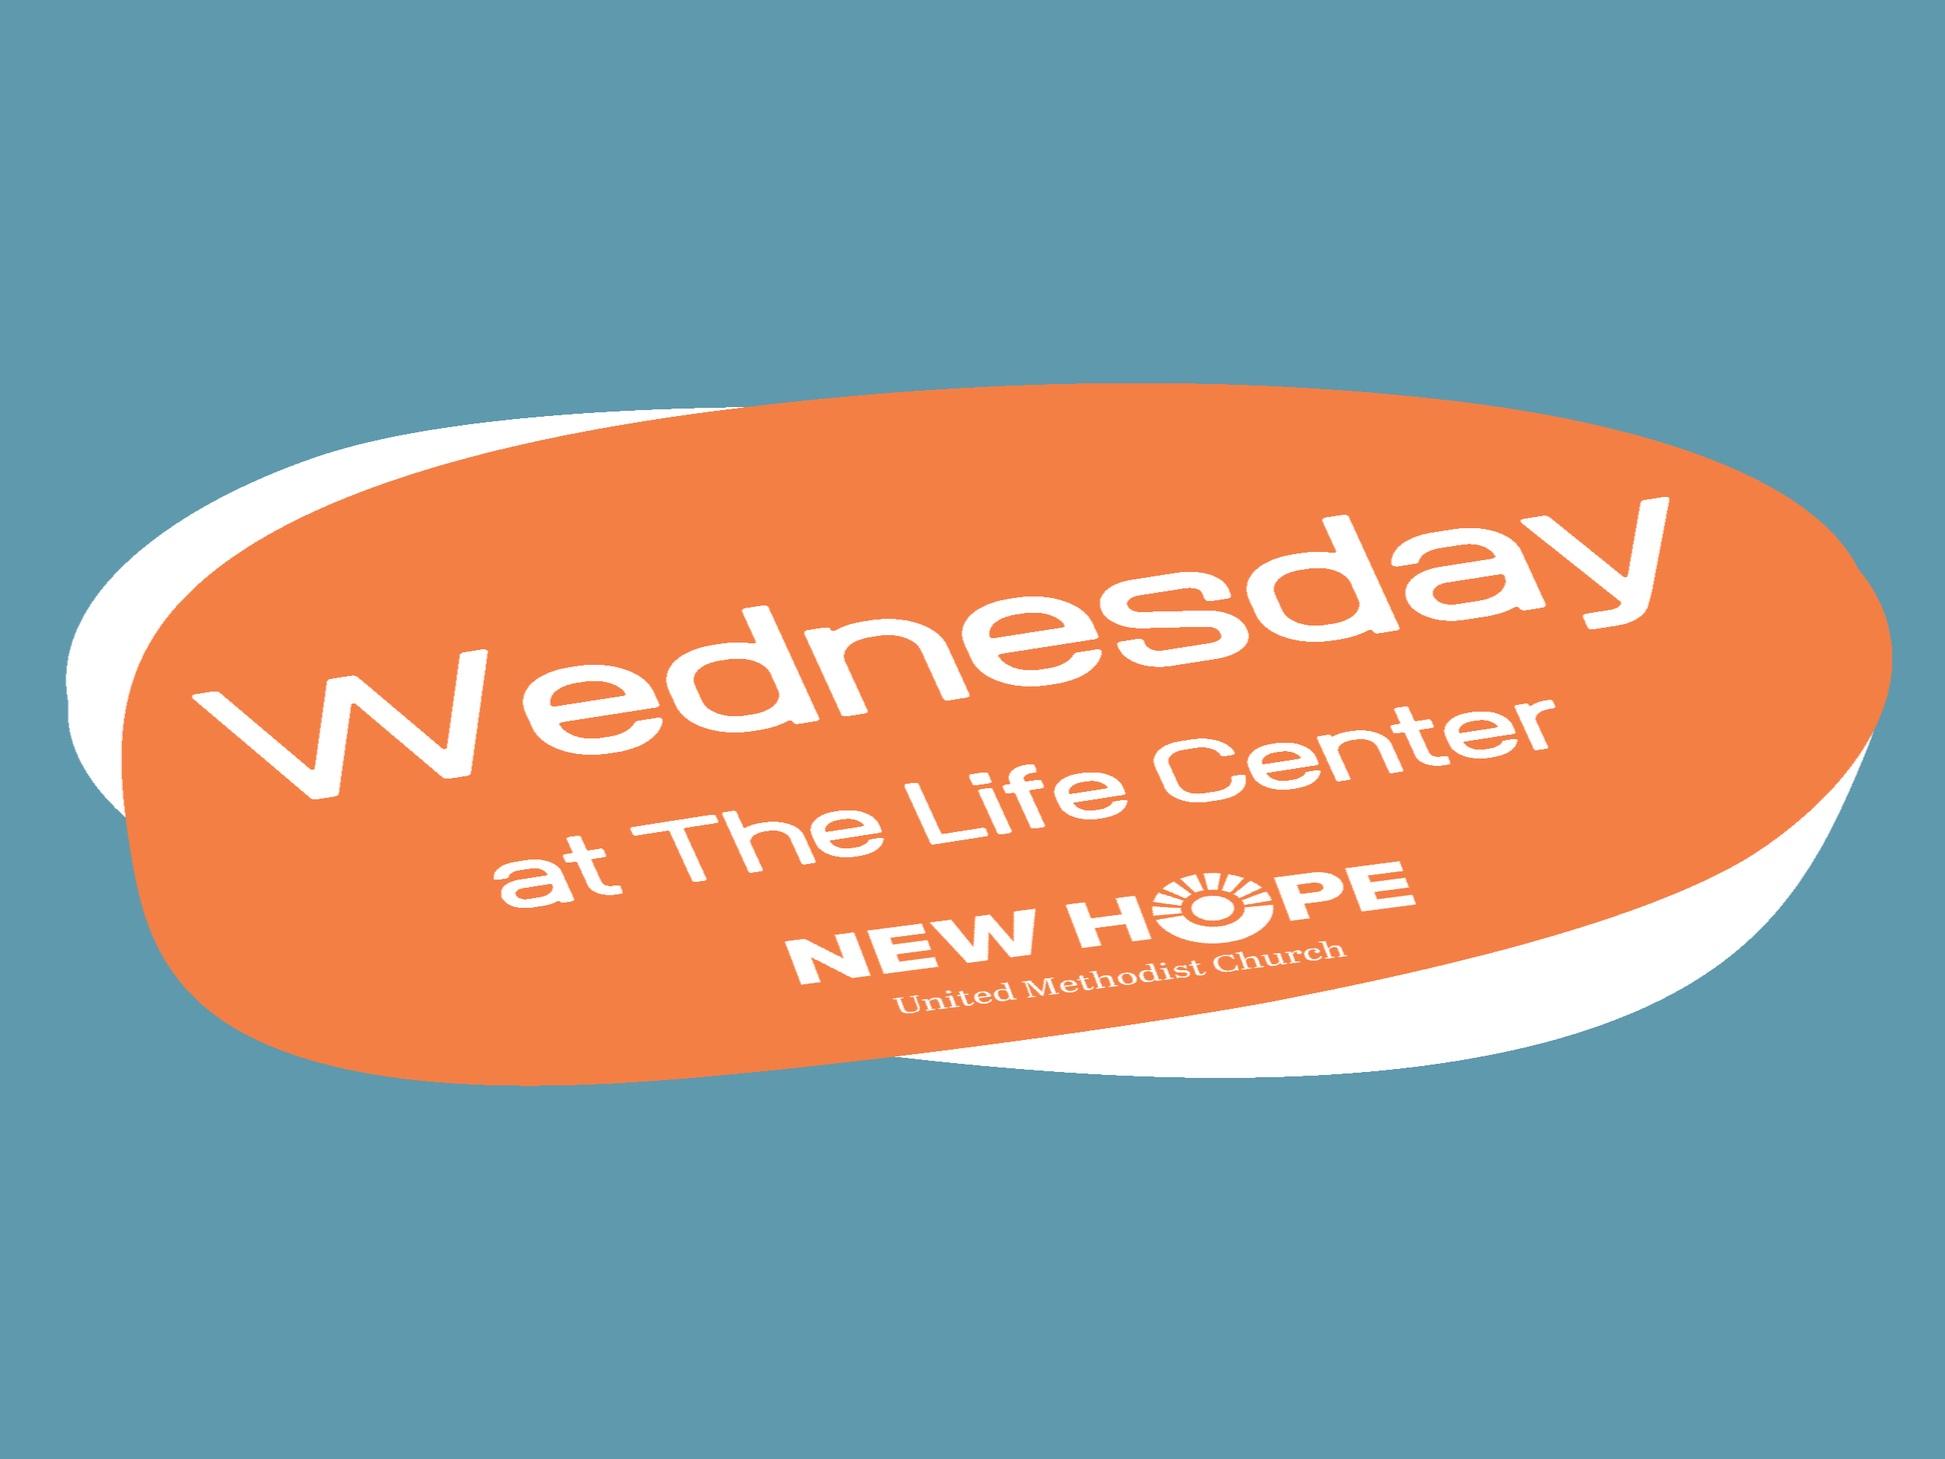 Wednesday+at+the+Life+Center.jpg